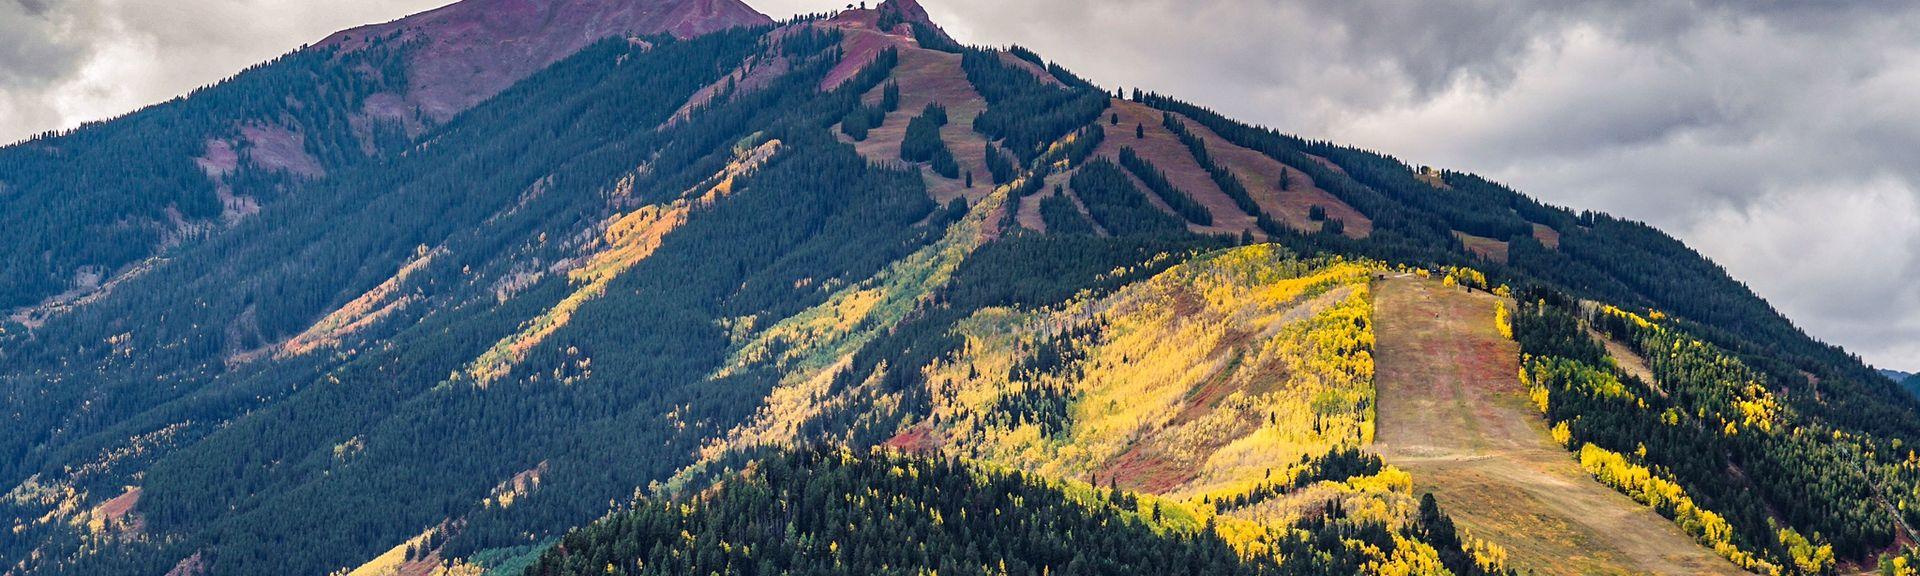 Buttermilk Mountain Ski Area, Aspen, CO, USA